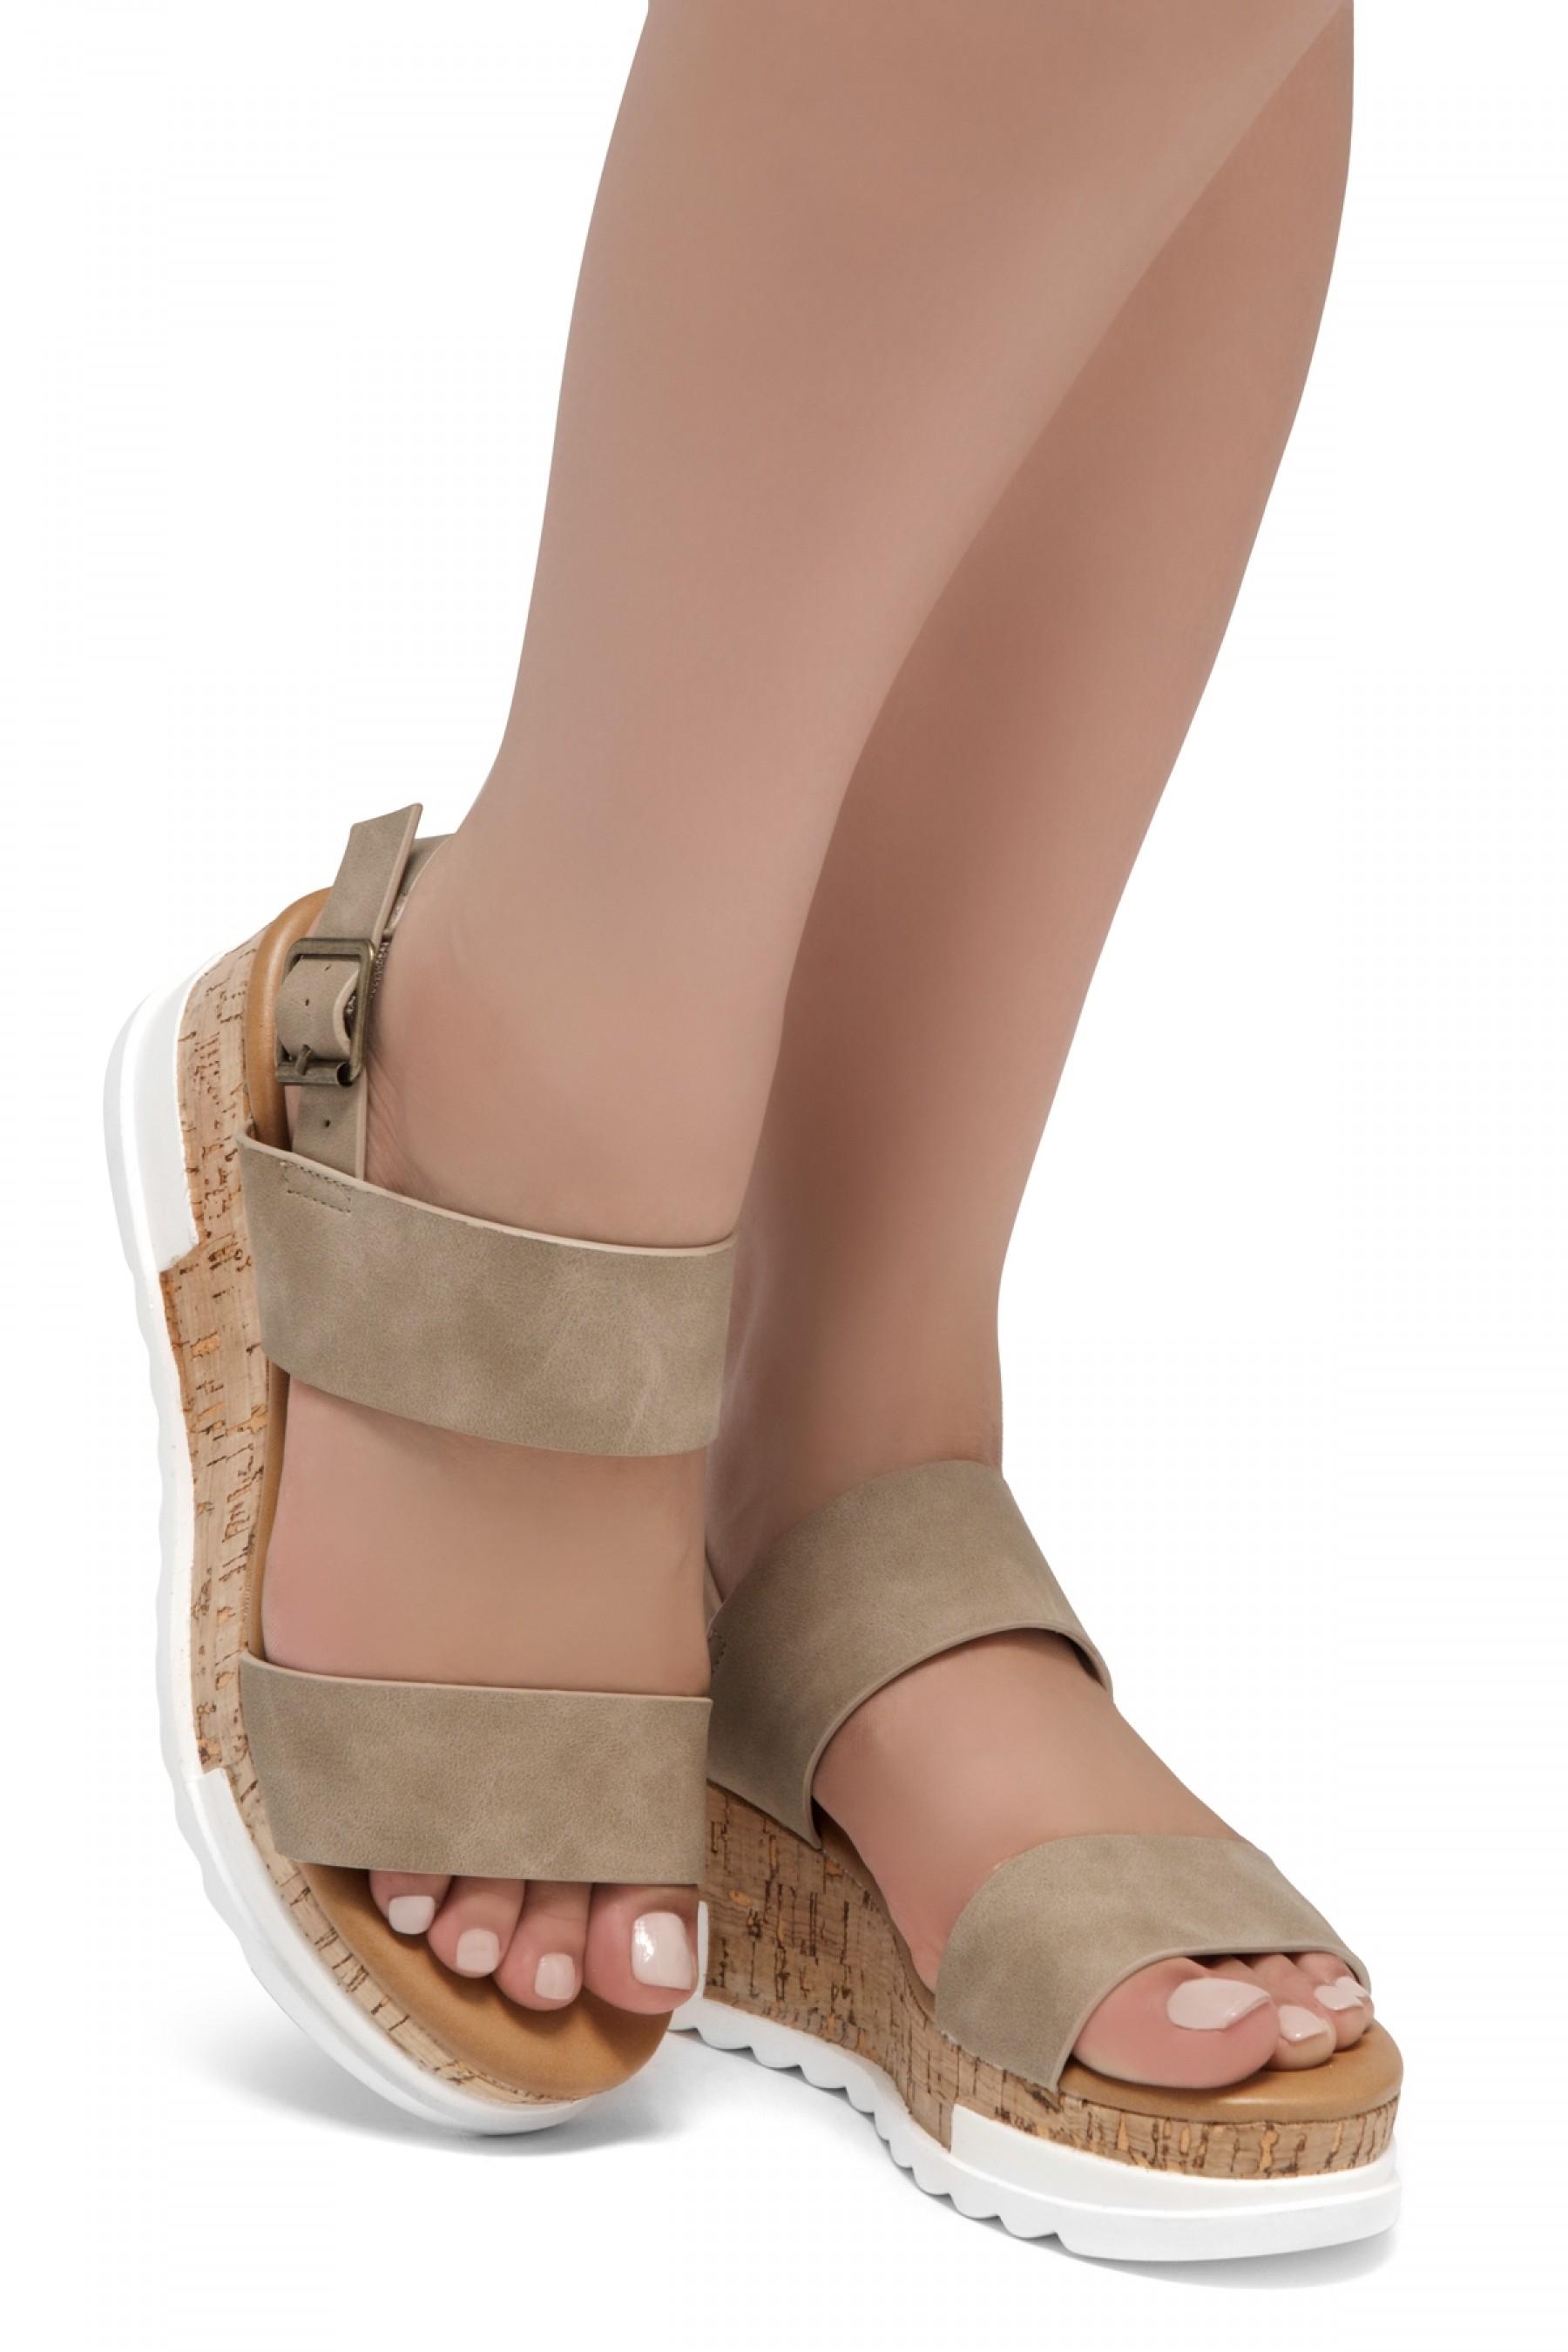 ShoeLand DIRASSA-Women's Open Toe Ankle Strap Platform Wedge Sandals(Natural)